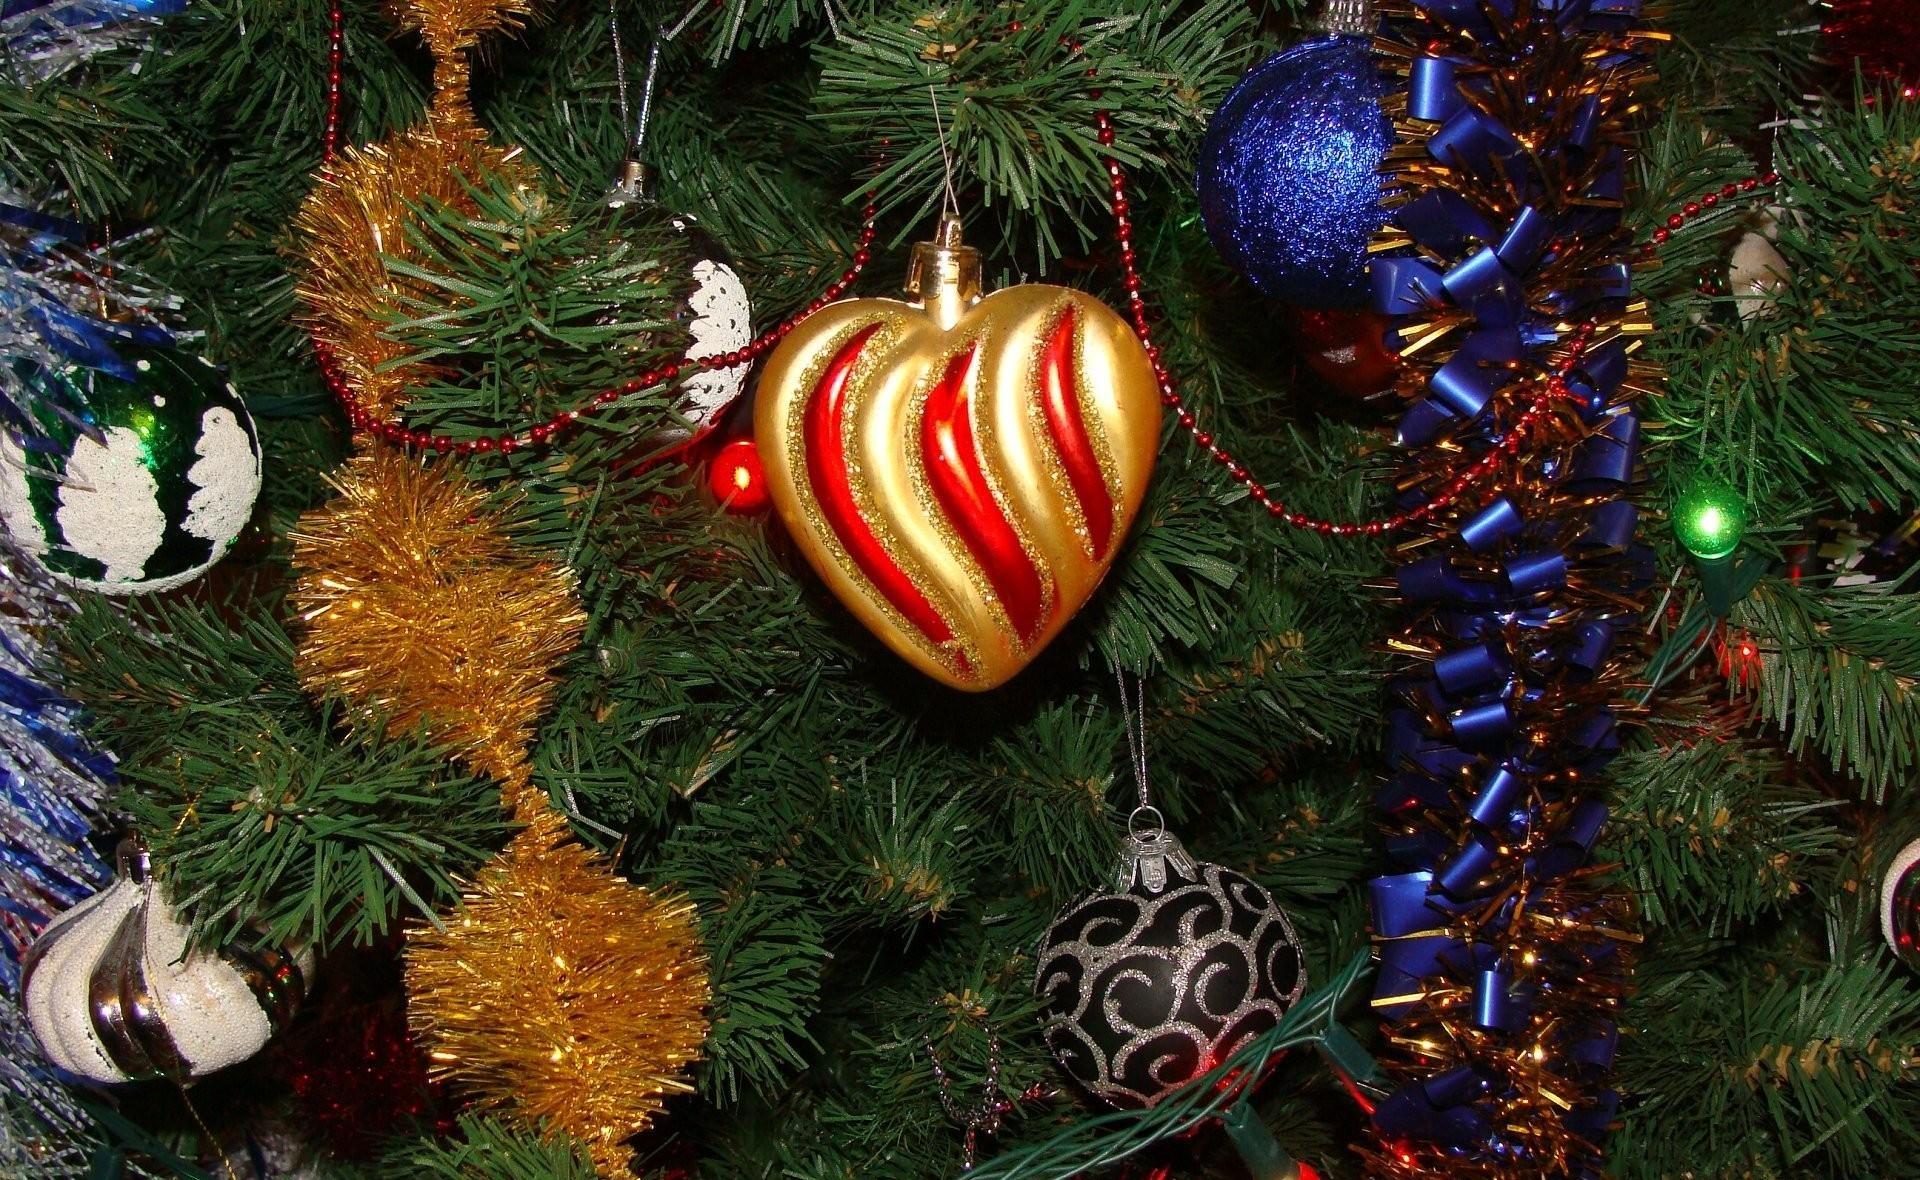 Wallpaper Christmas Decorations Christmas Tree Tinsel Garland